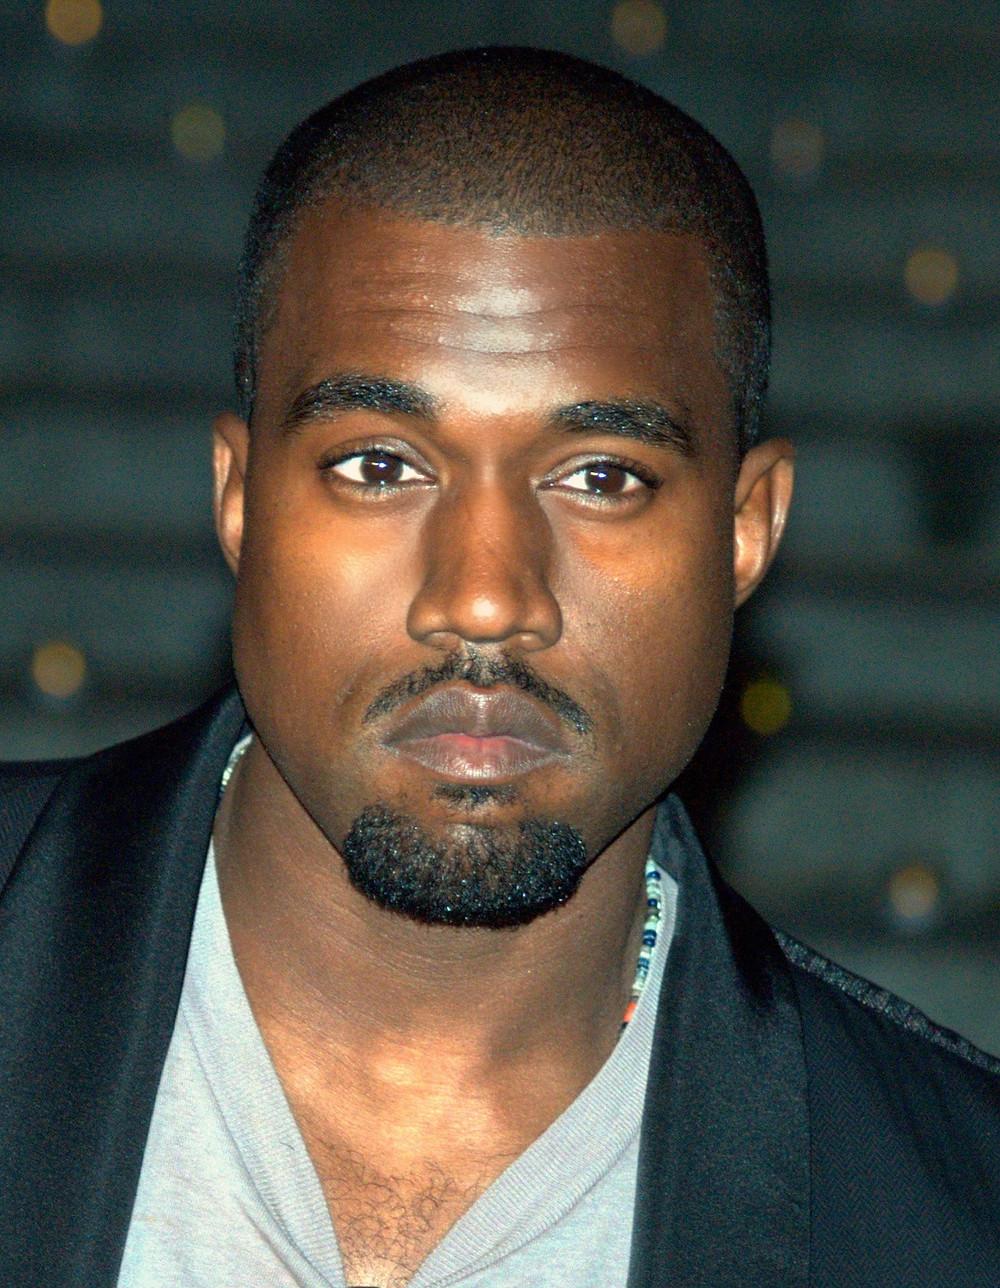 Celebrities, top 10, Lifestyle, affectmag, Kayne West